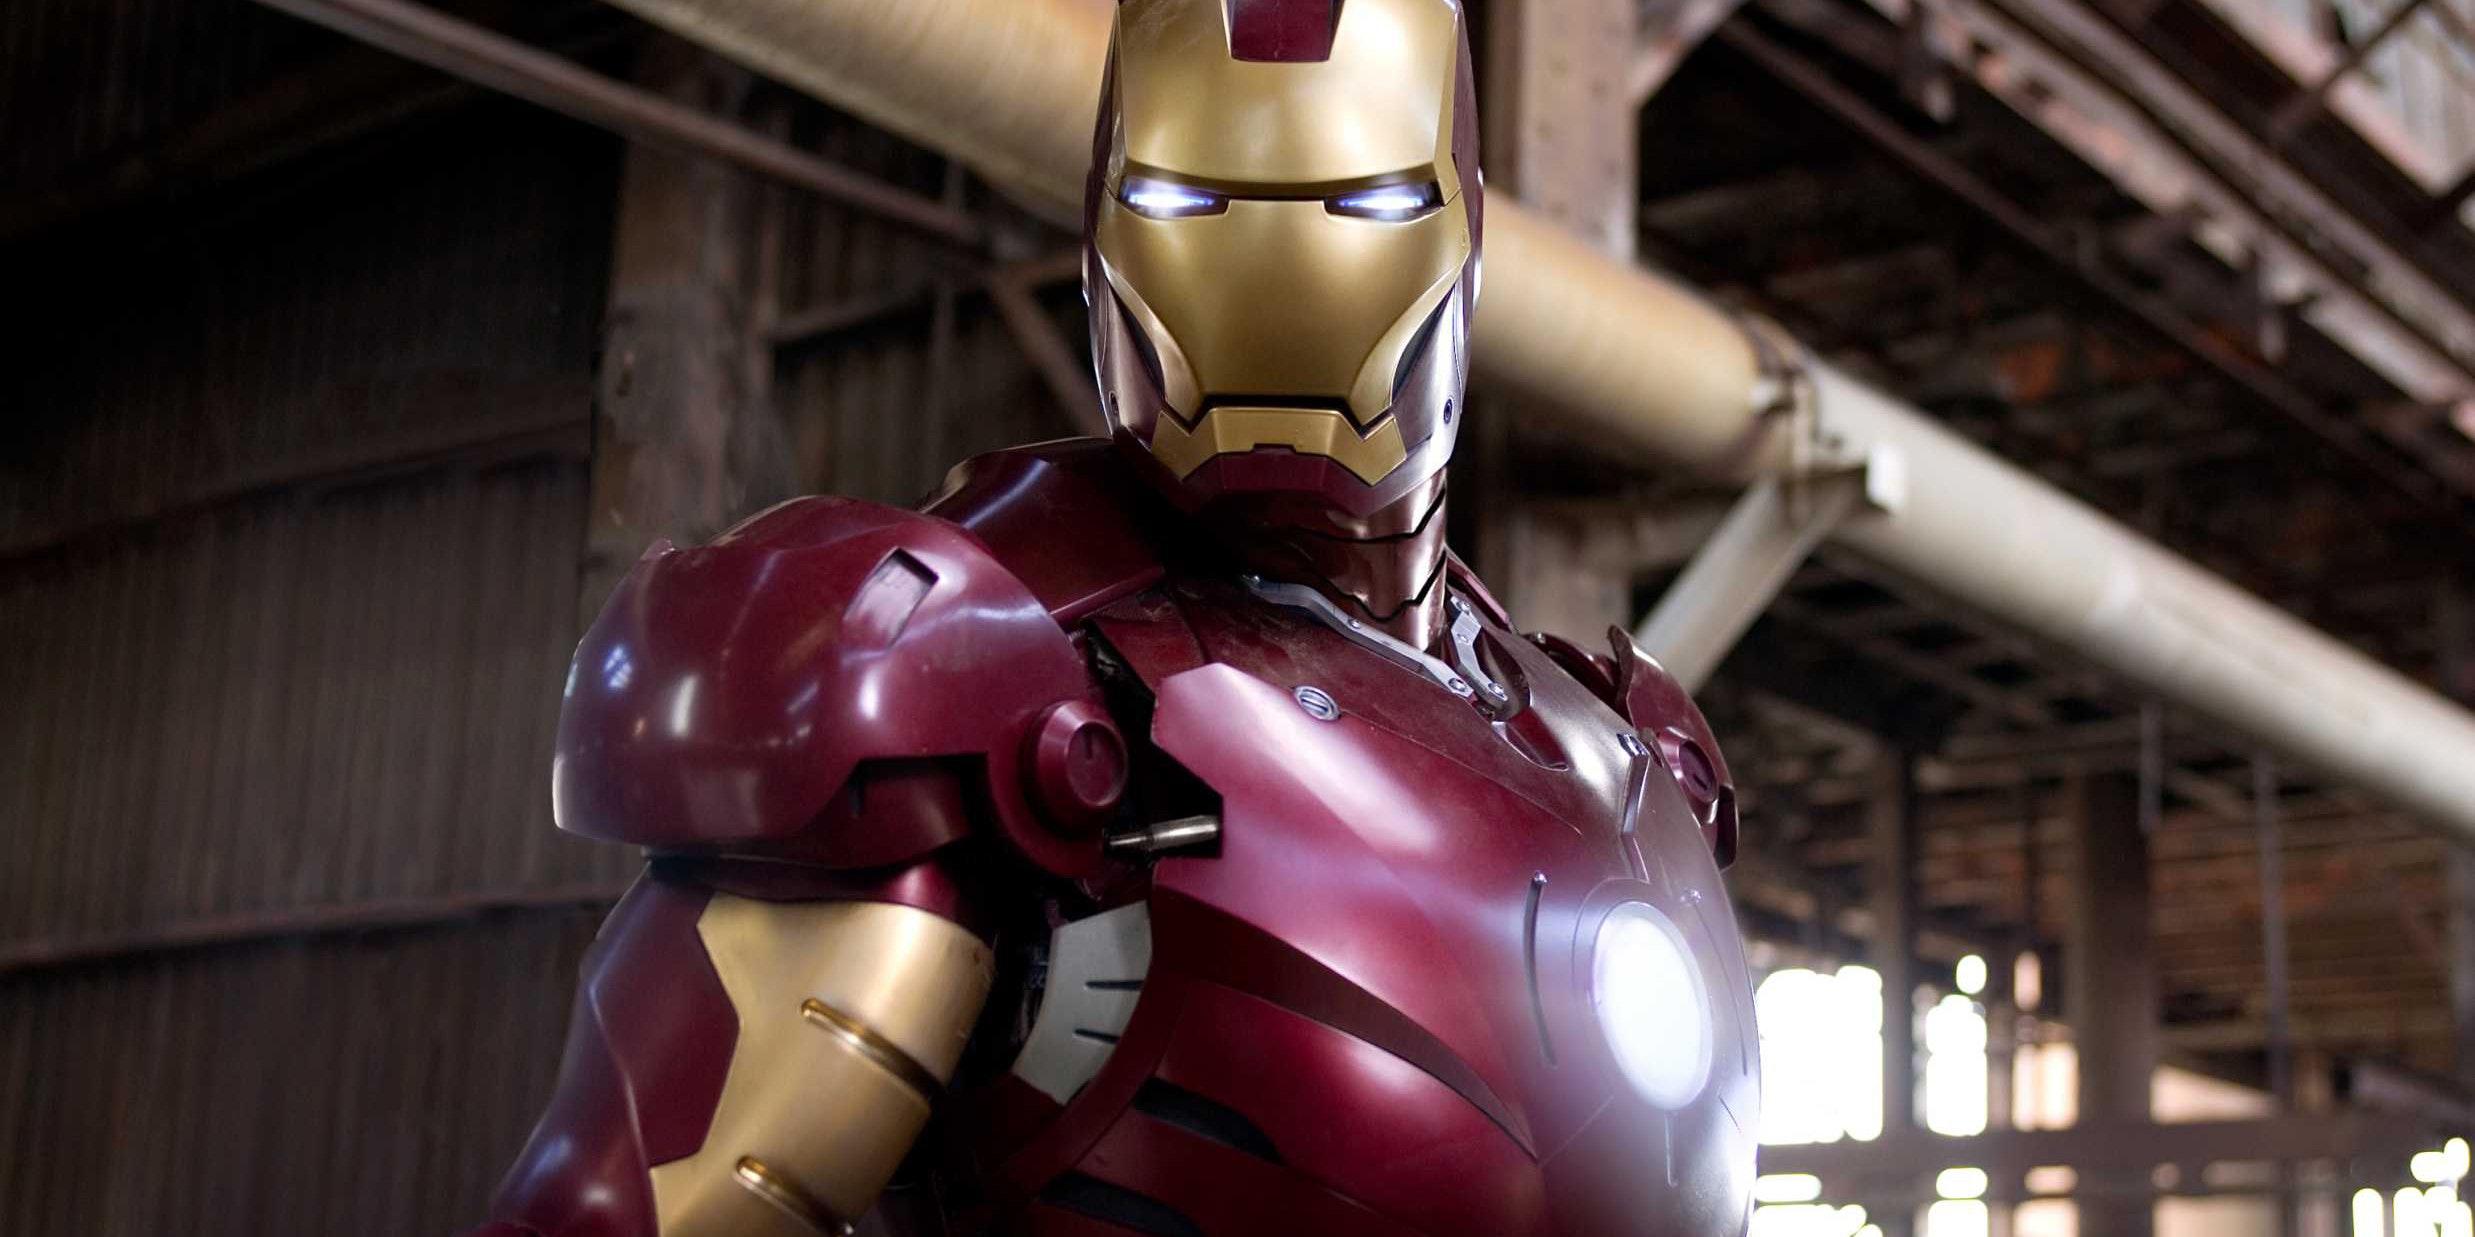 'Avengers: Endgame' Leak Reveals a Forgotten Character Could Help Iron Man